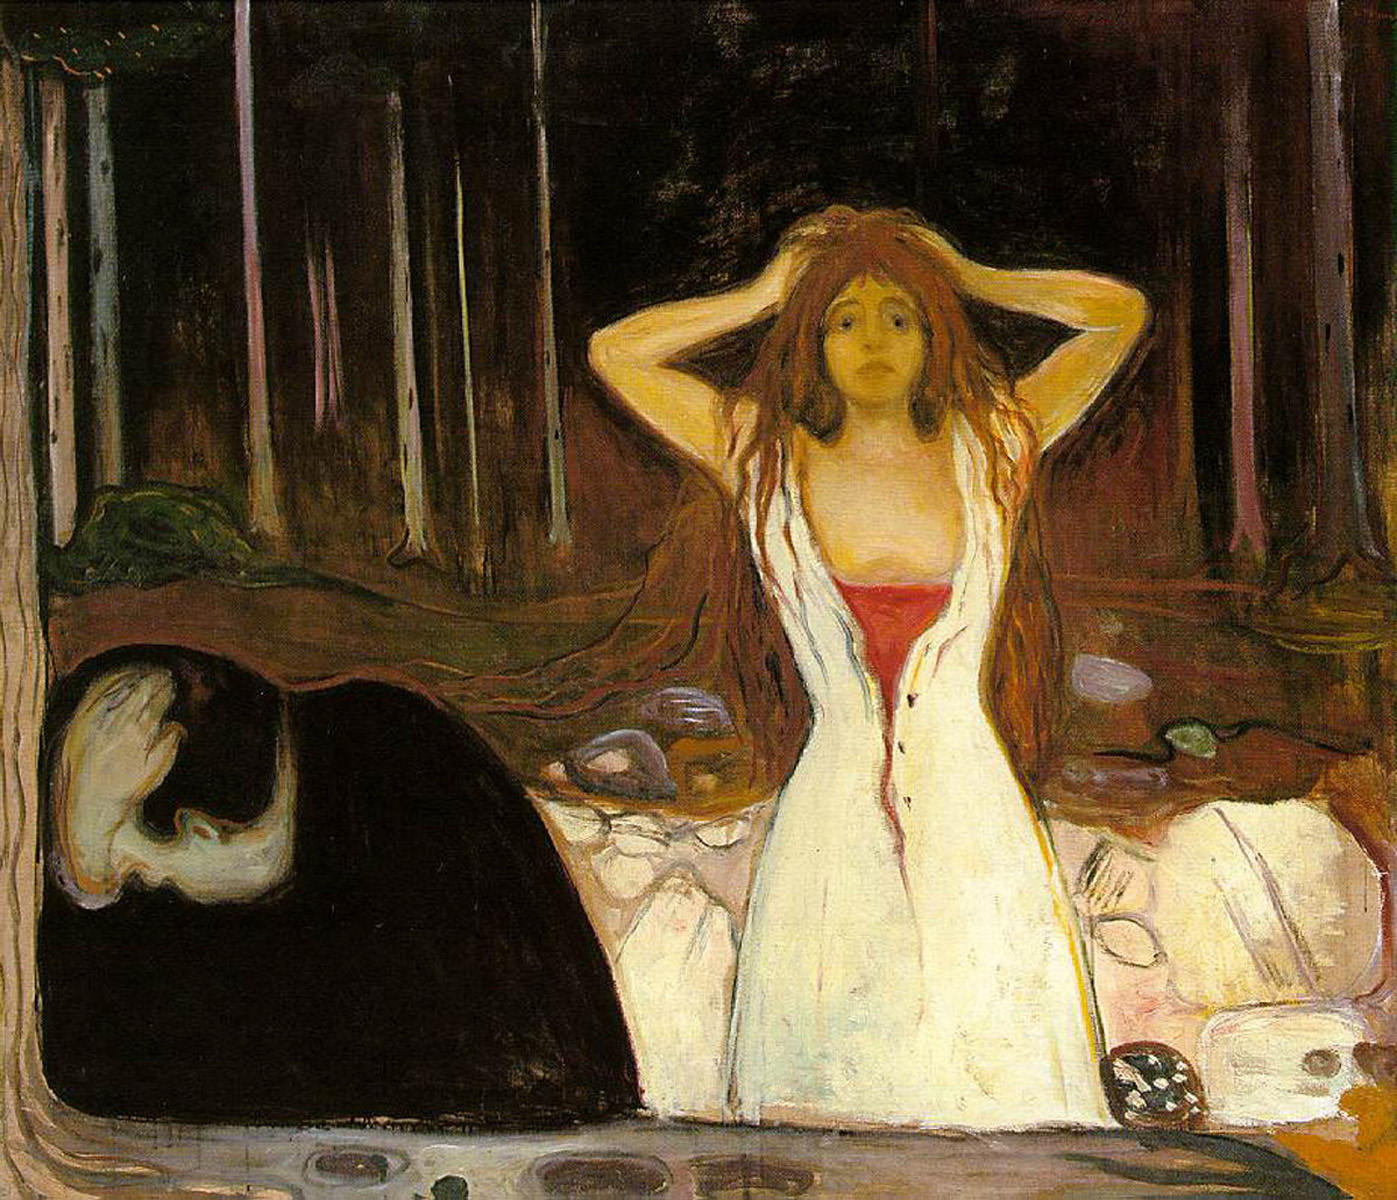 8. Munch, Cenizas